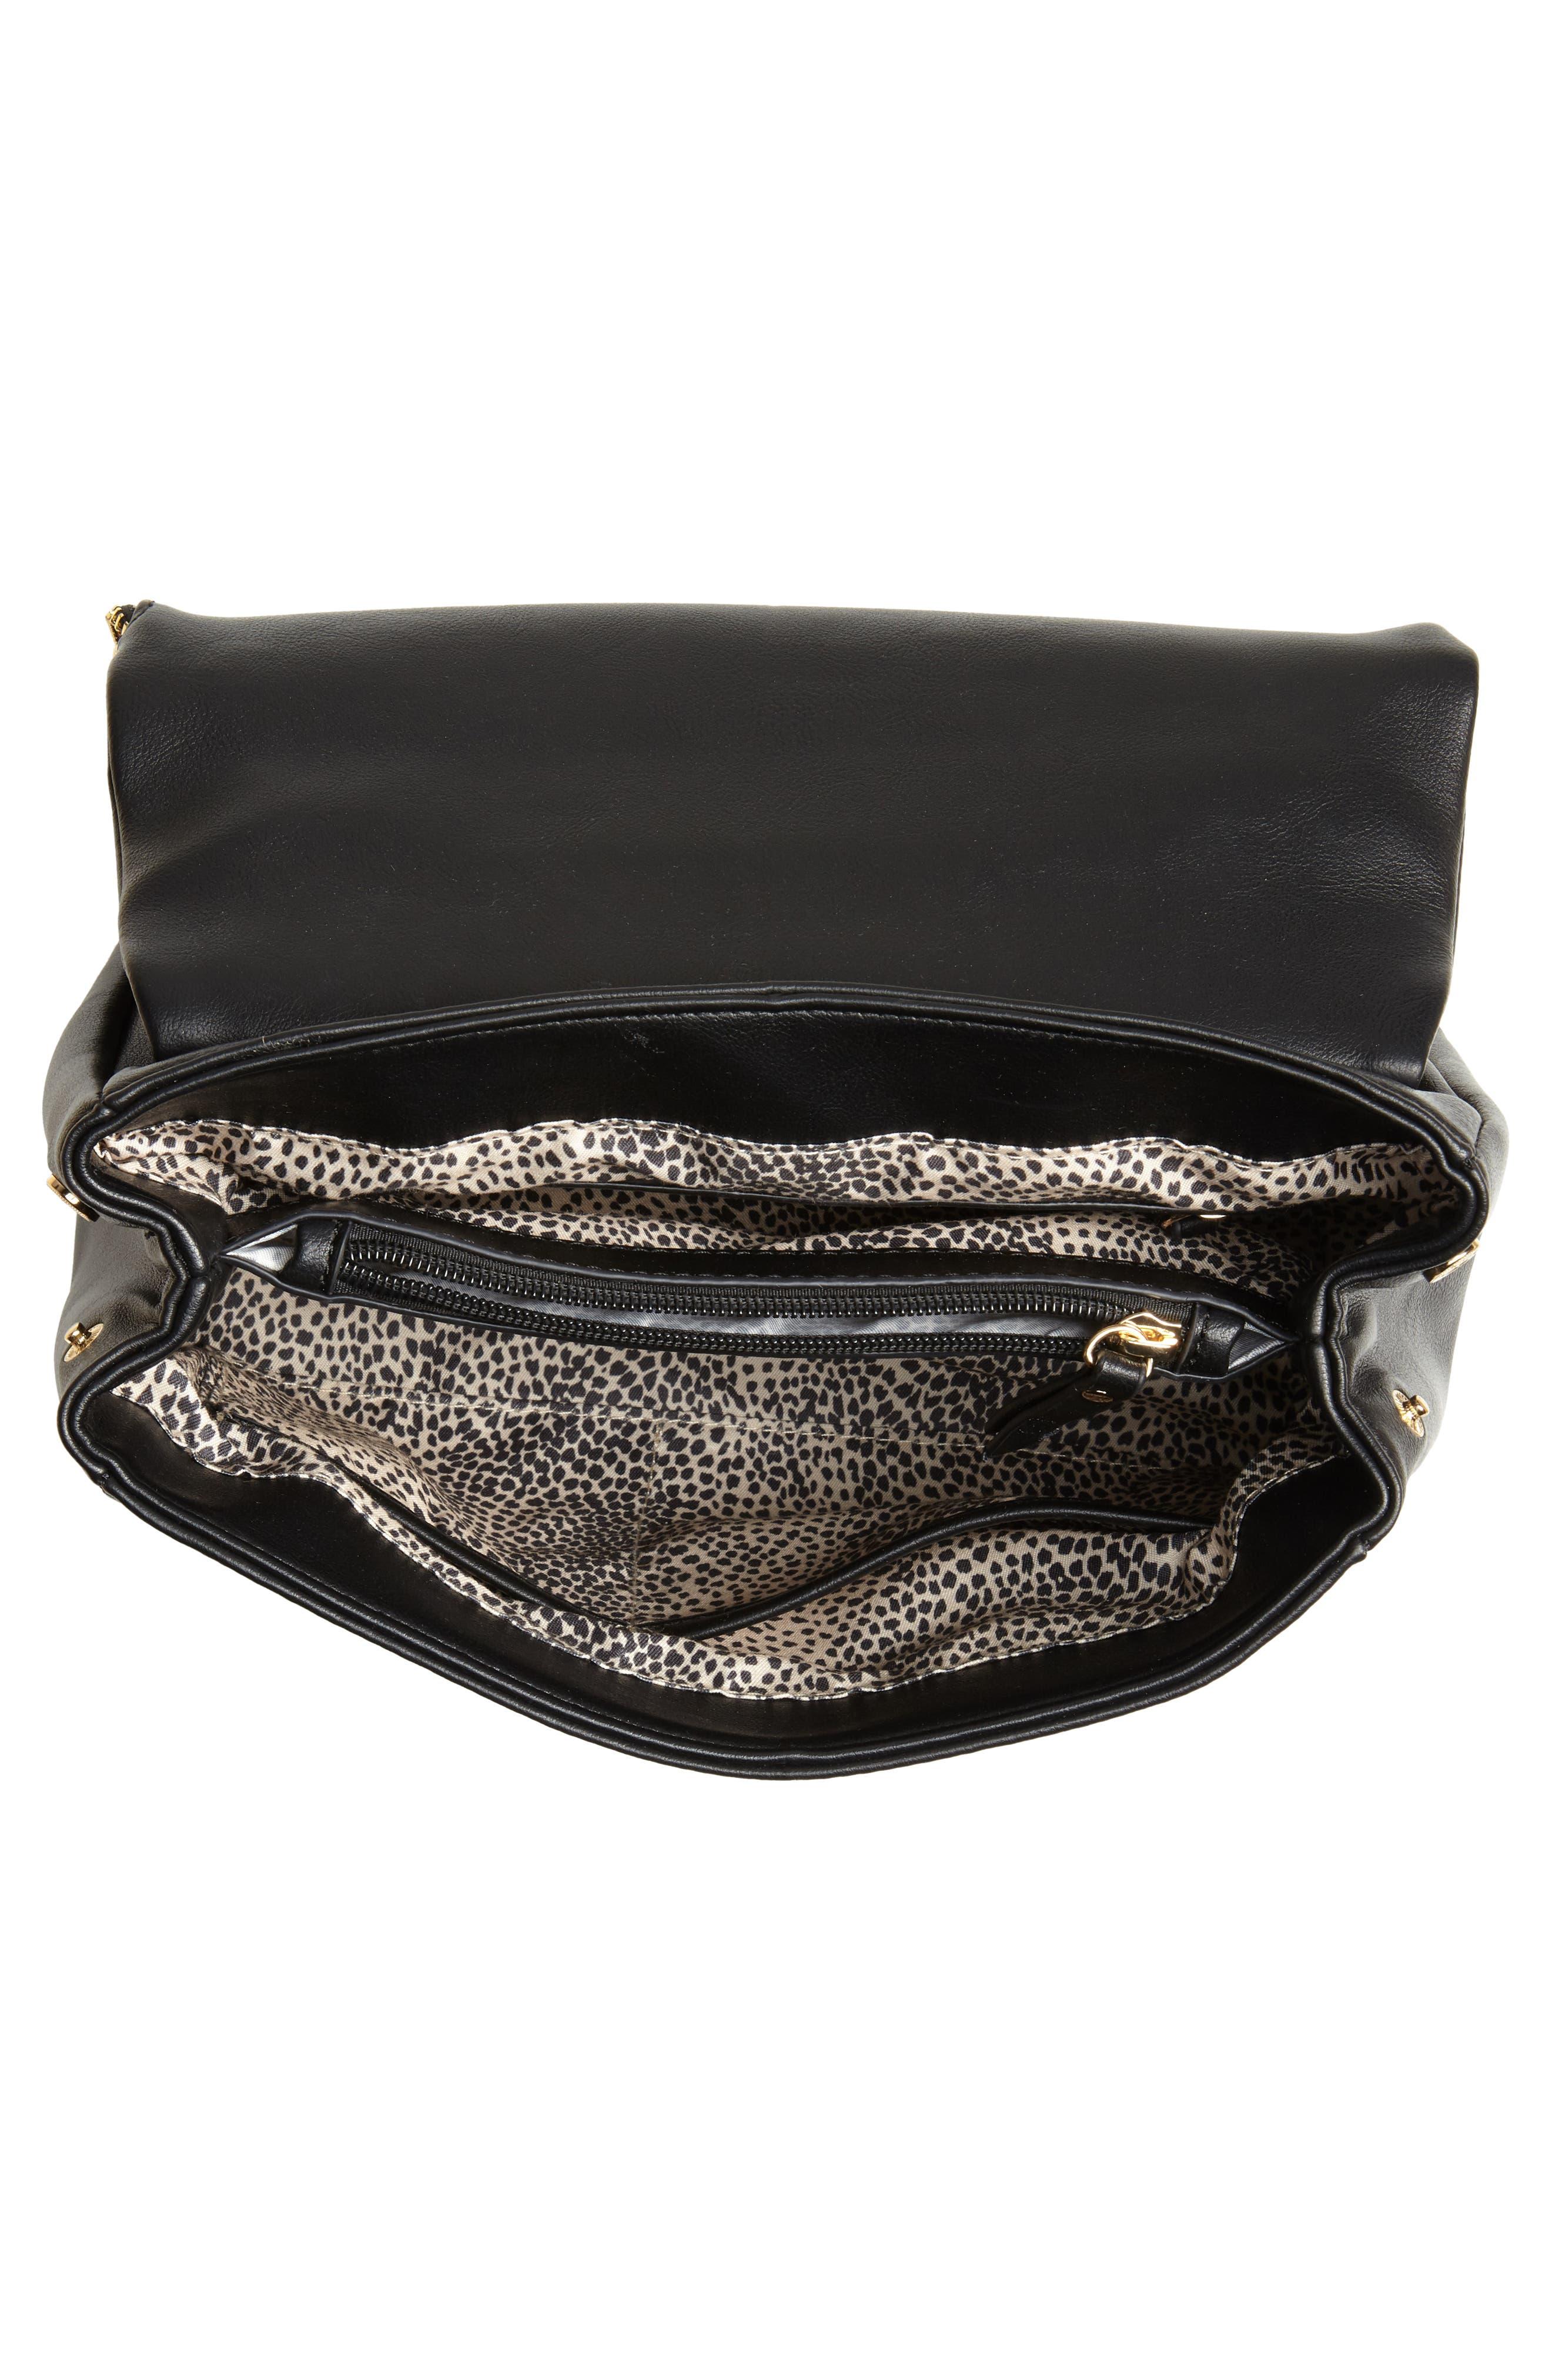 Rubie Faux Leather Crossbody Bag,                             Alternate thumbnail 4, color,                             BLACK